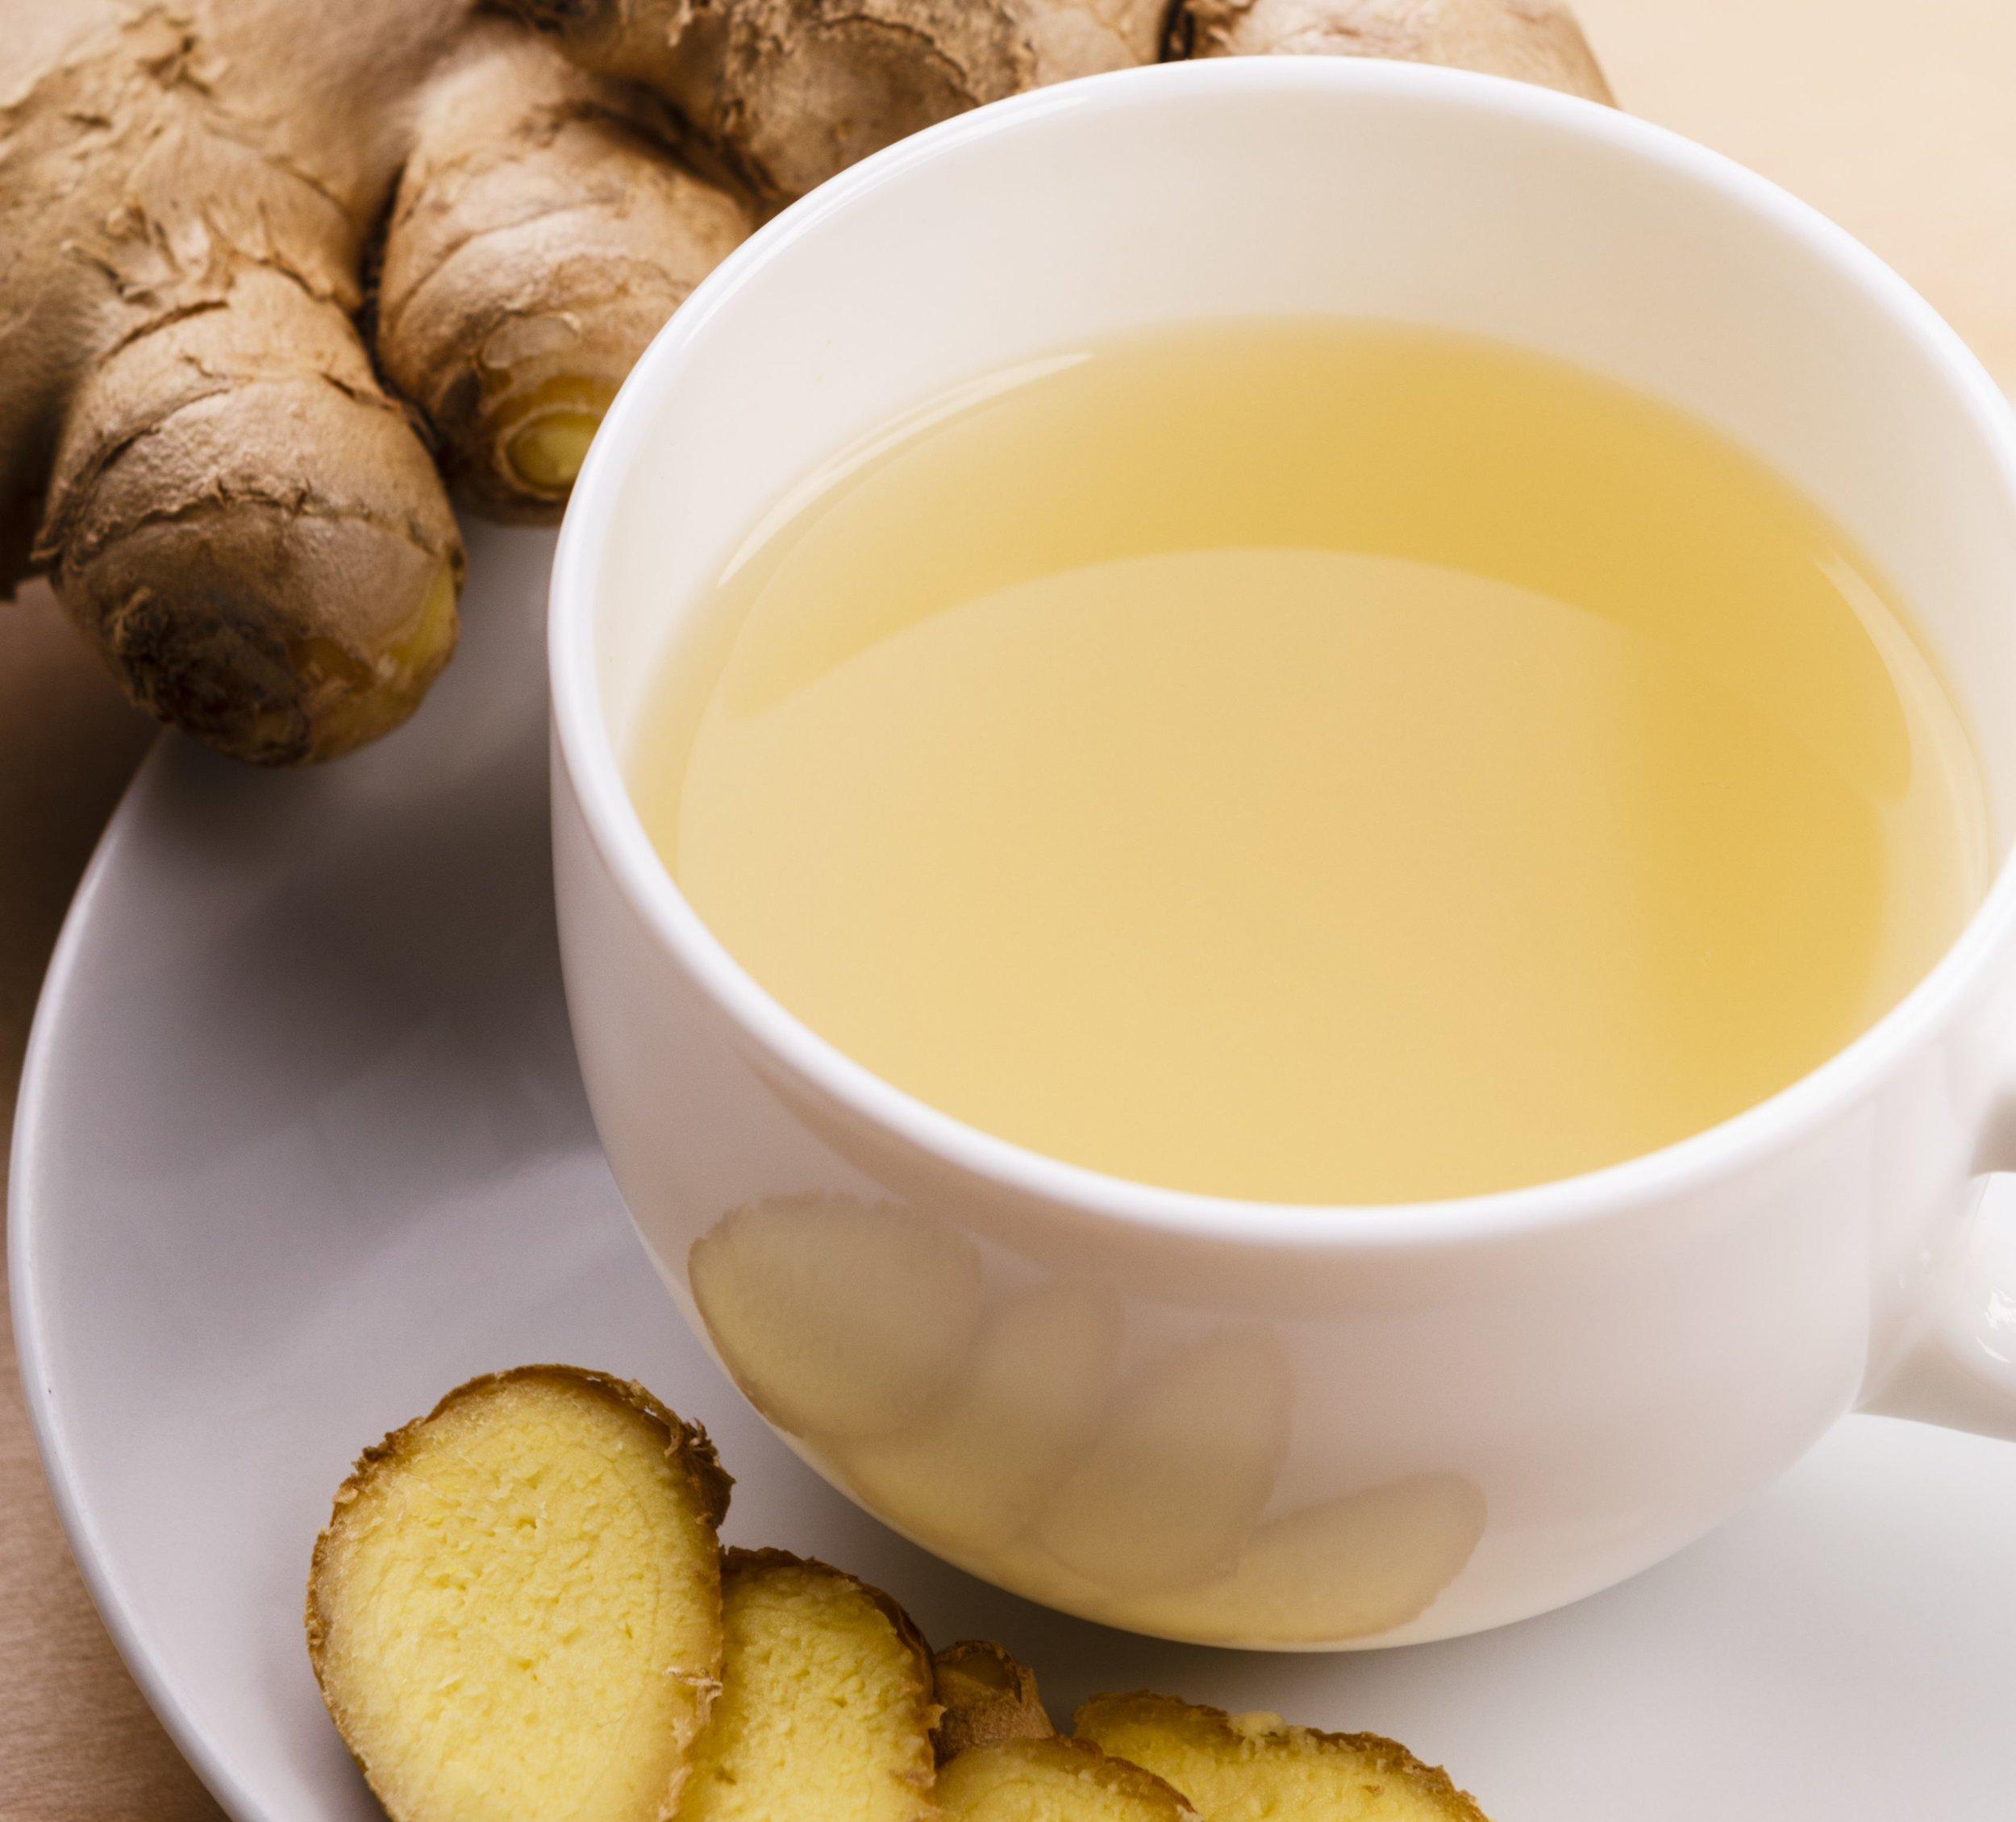 1-ginger-tea-letty-17-58d15ad73df78c3c4fdcb51c.jpg